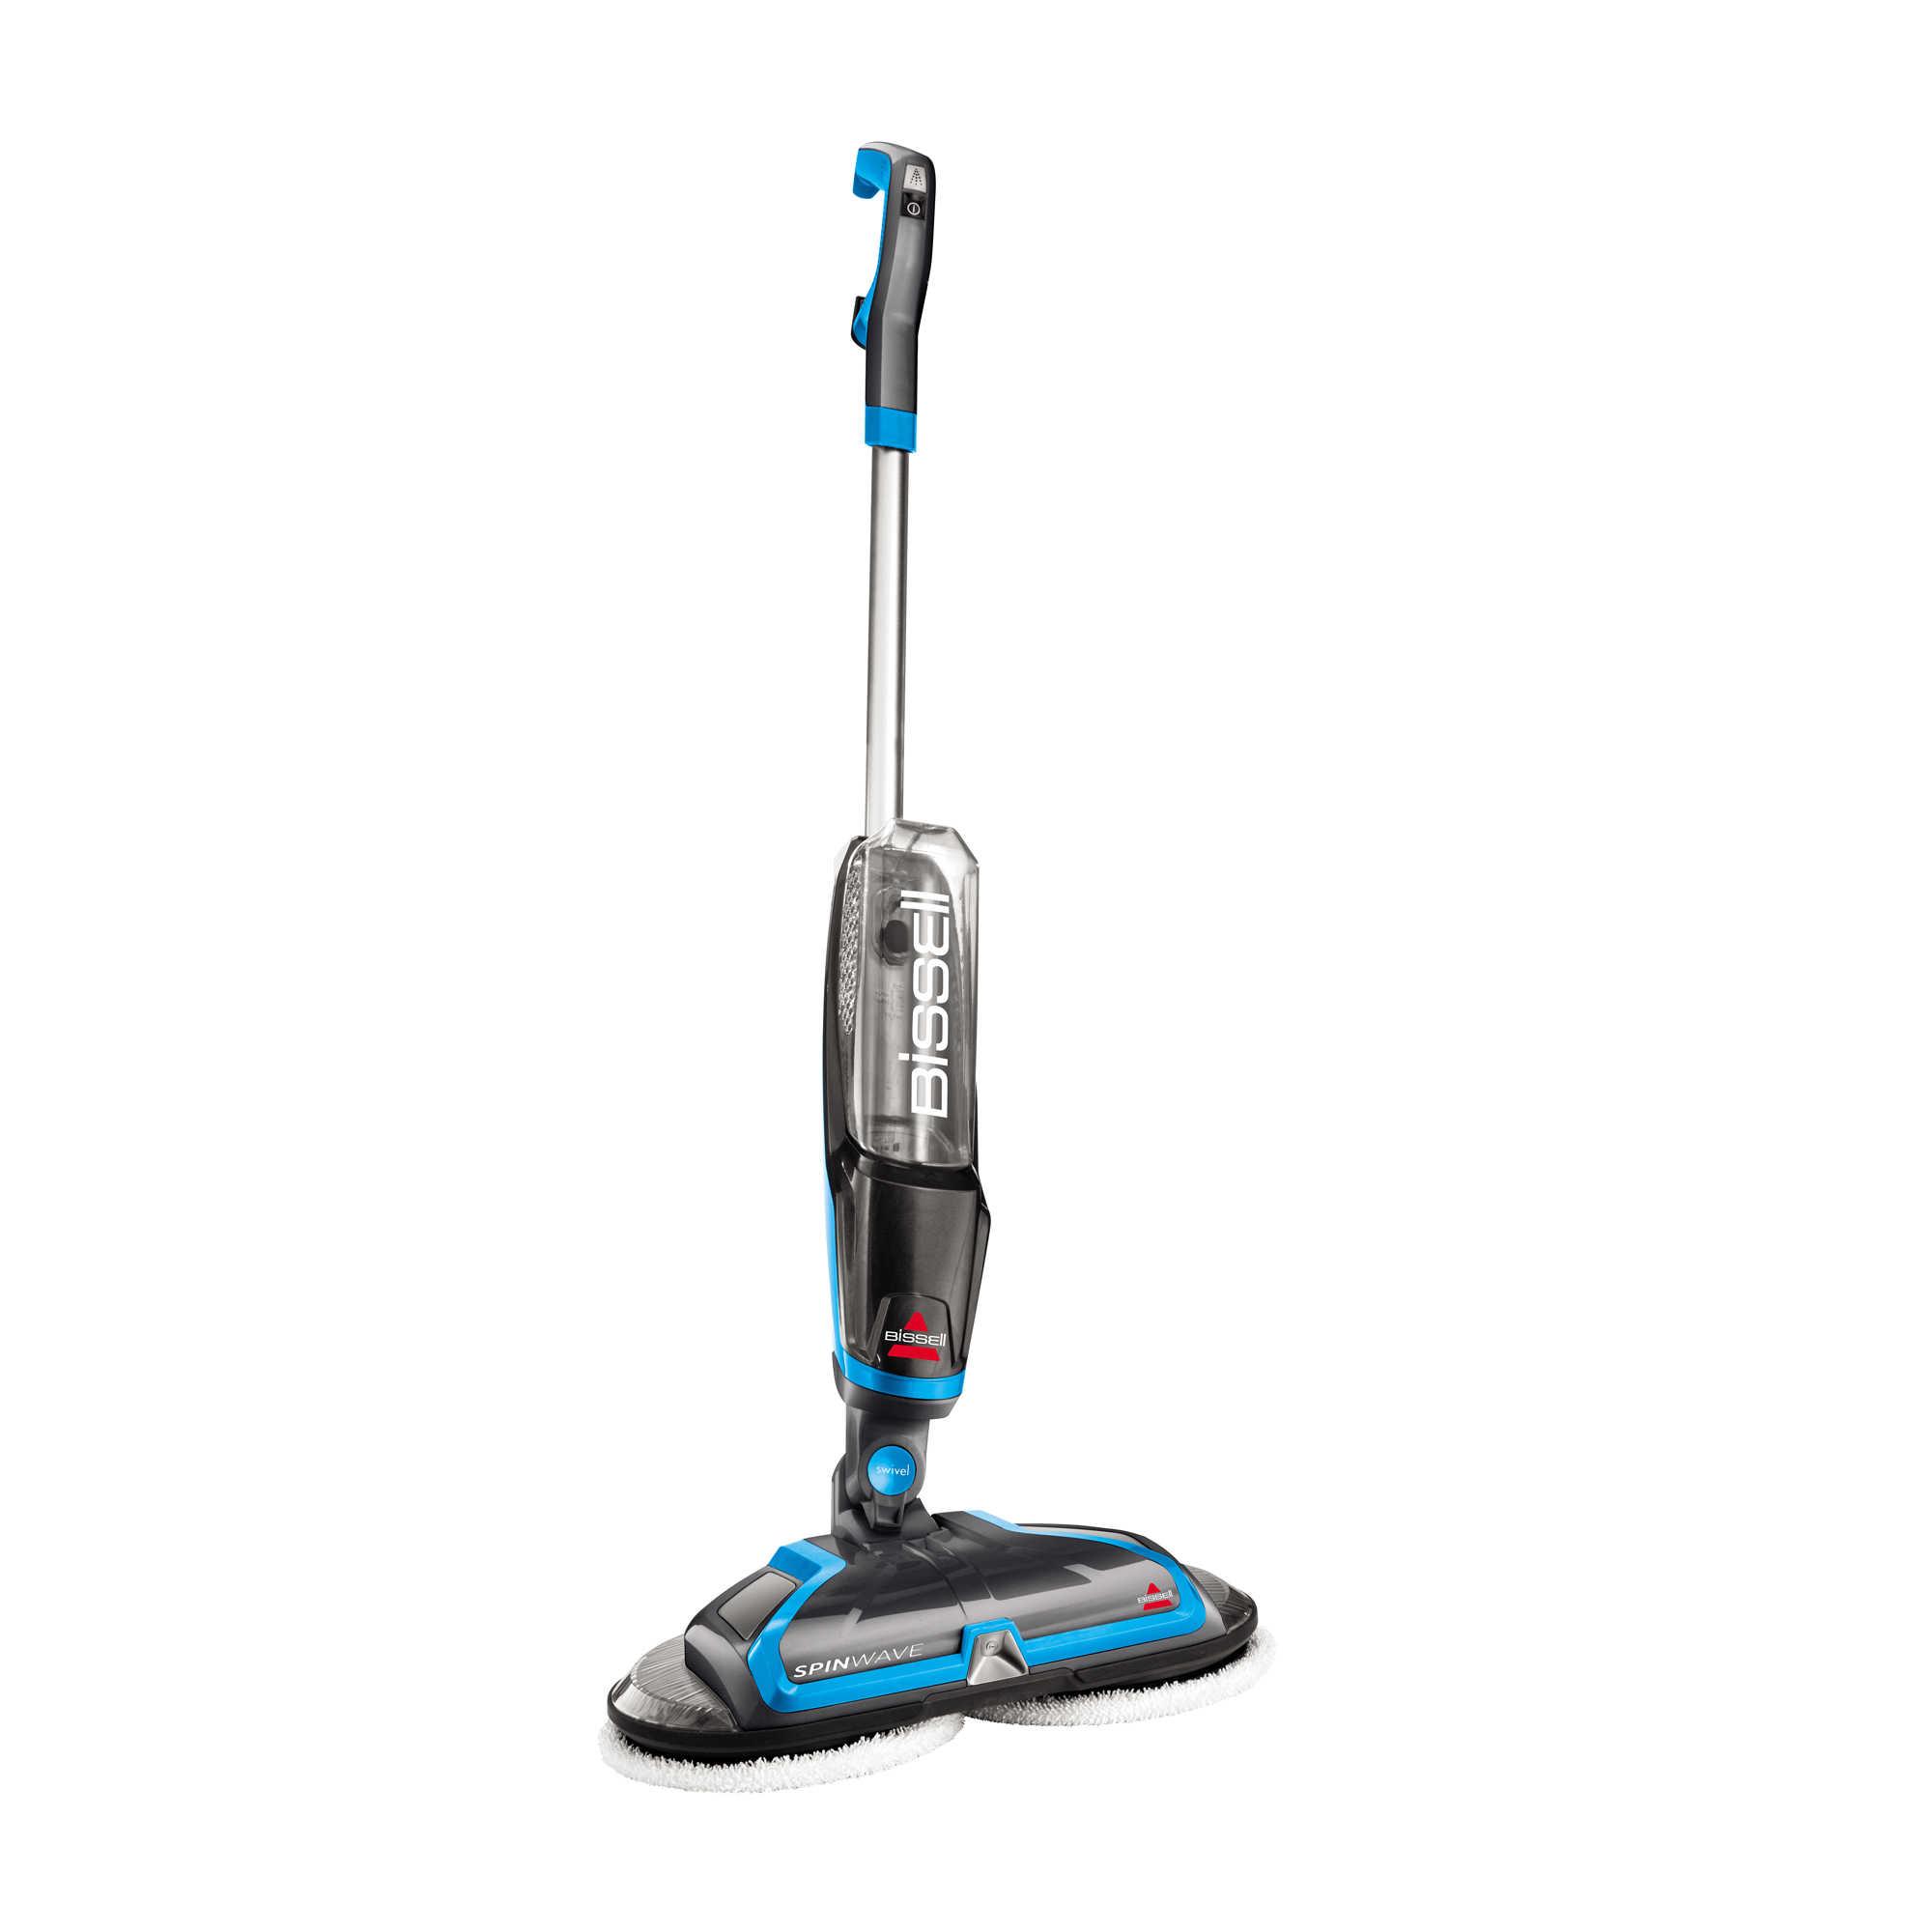 BISSELL® SpinWave™ Plus Hard Floor Mop in Titanium